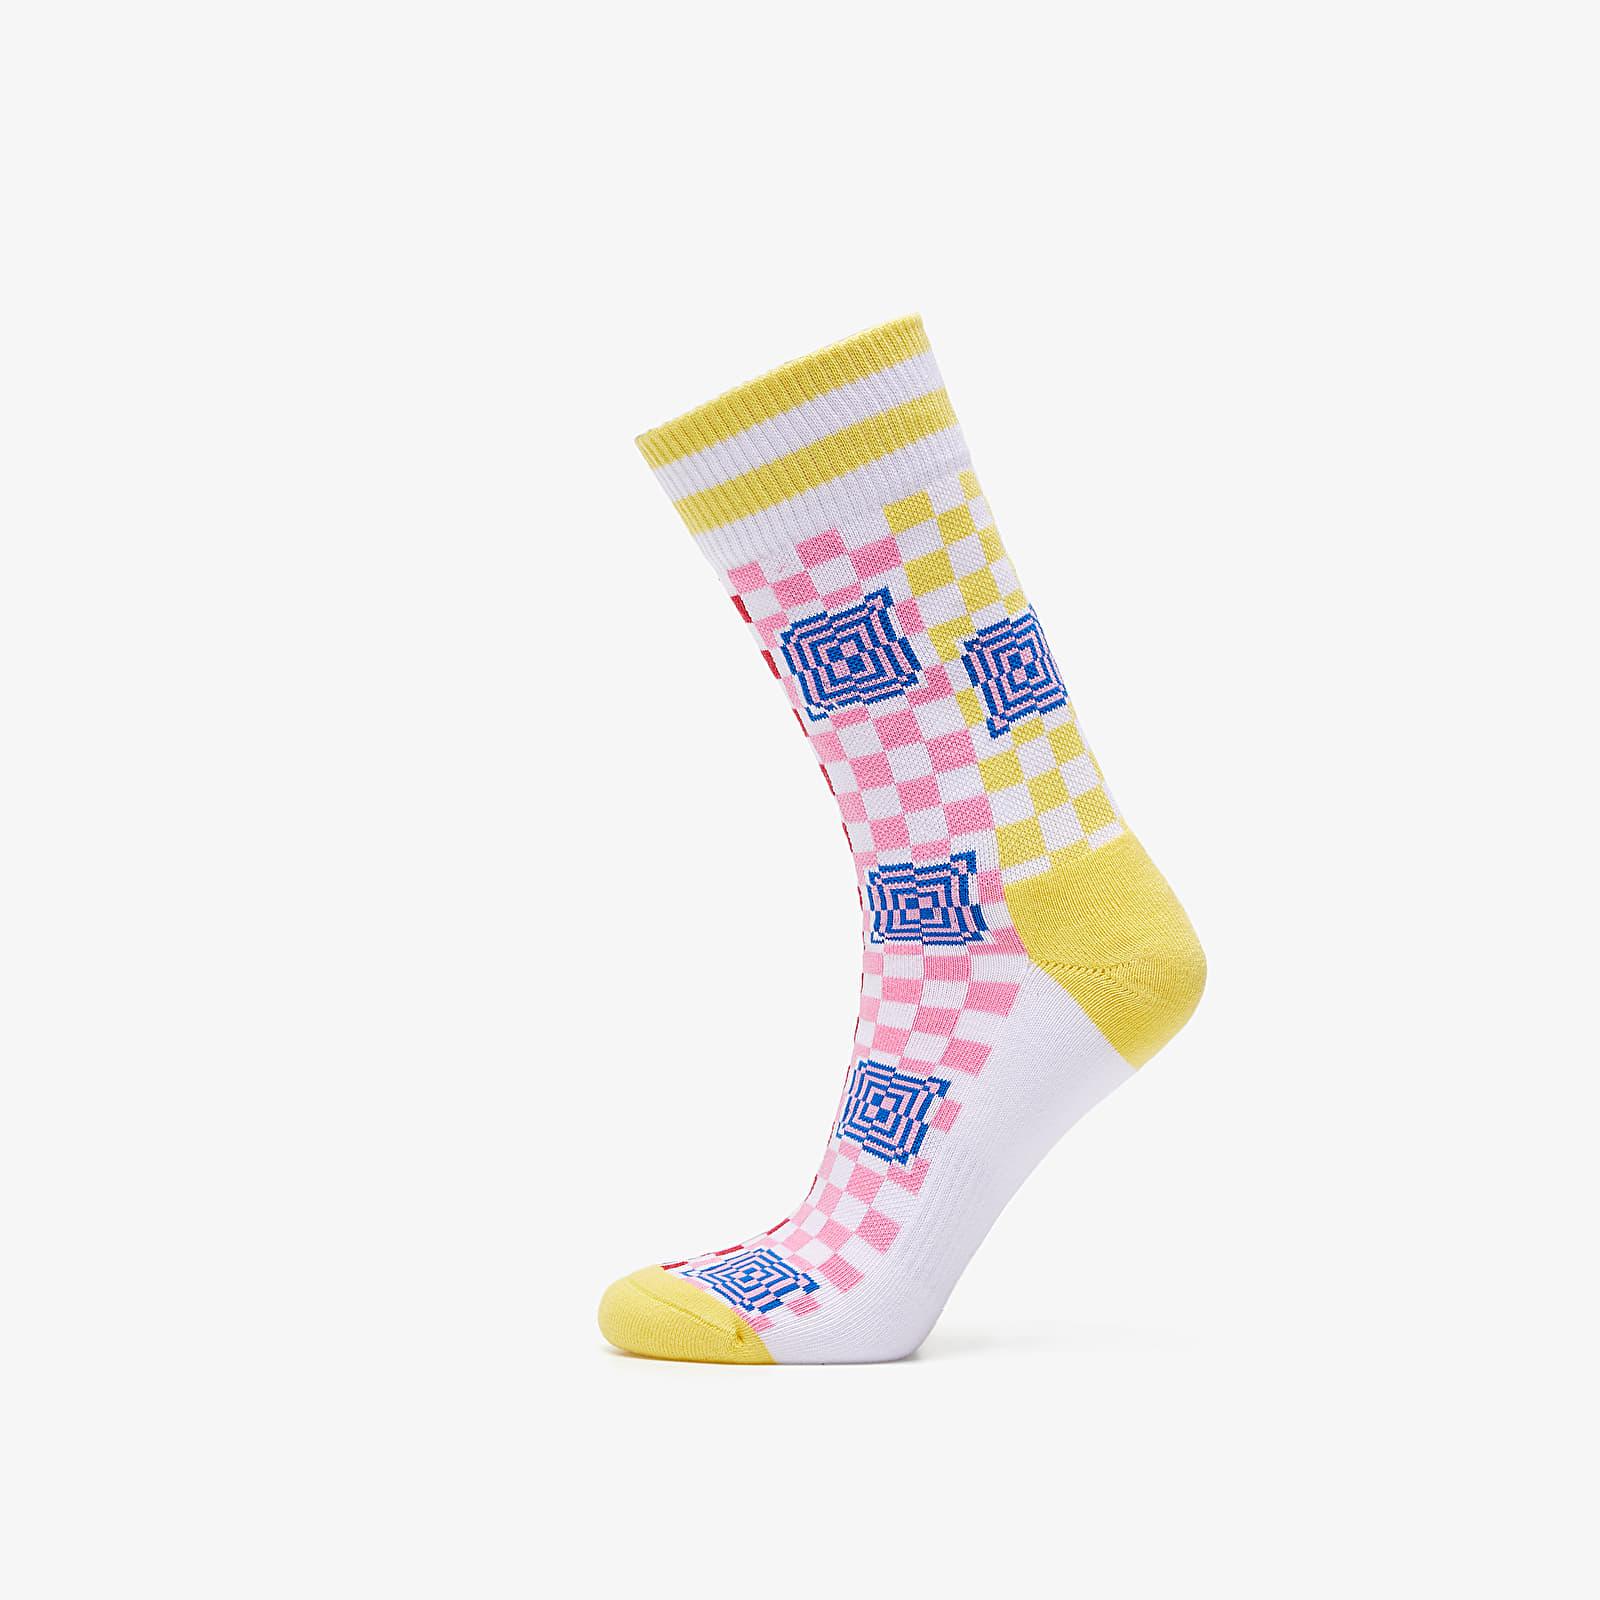 Chaussettes Happy Socks Athletic Crew Socks Multicolor